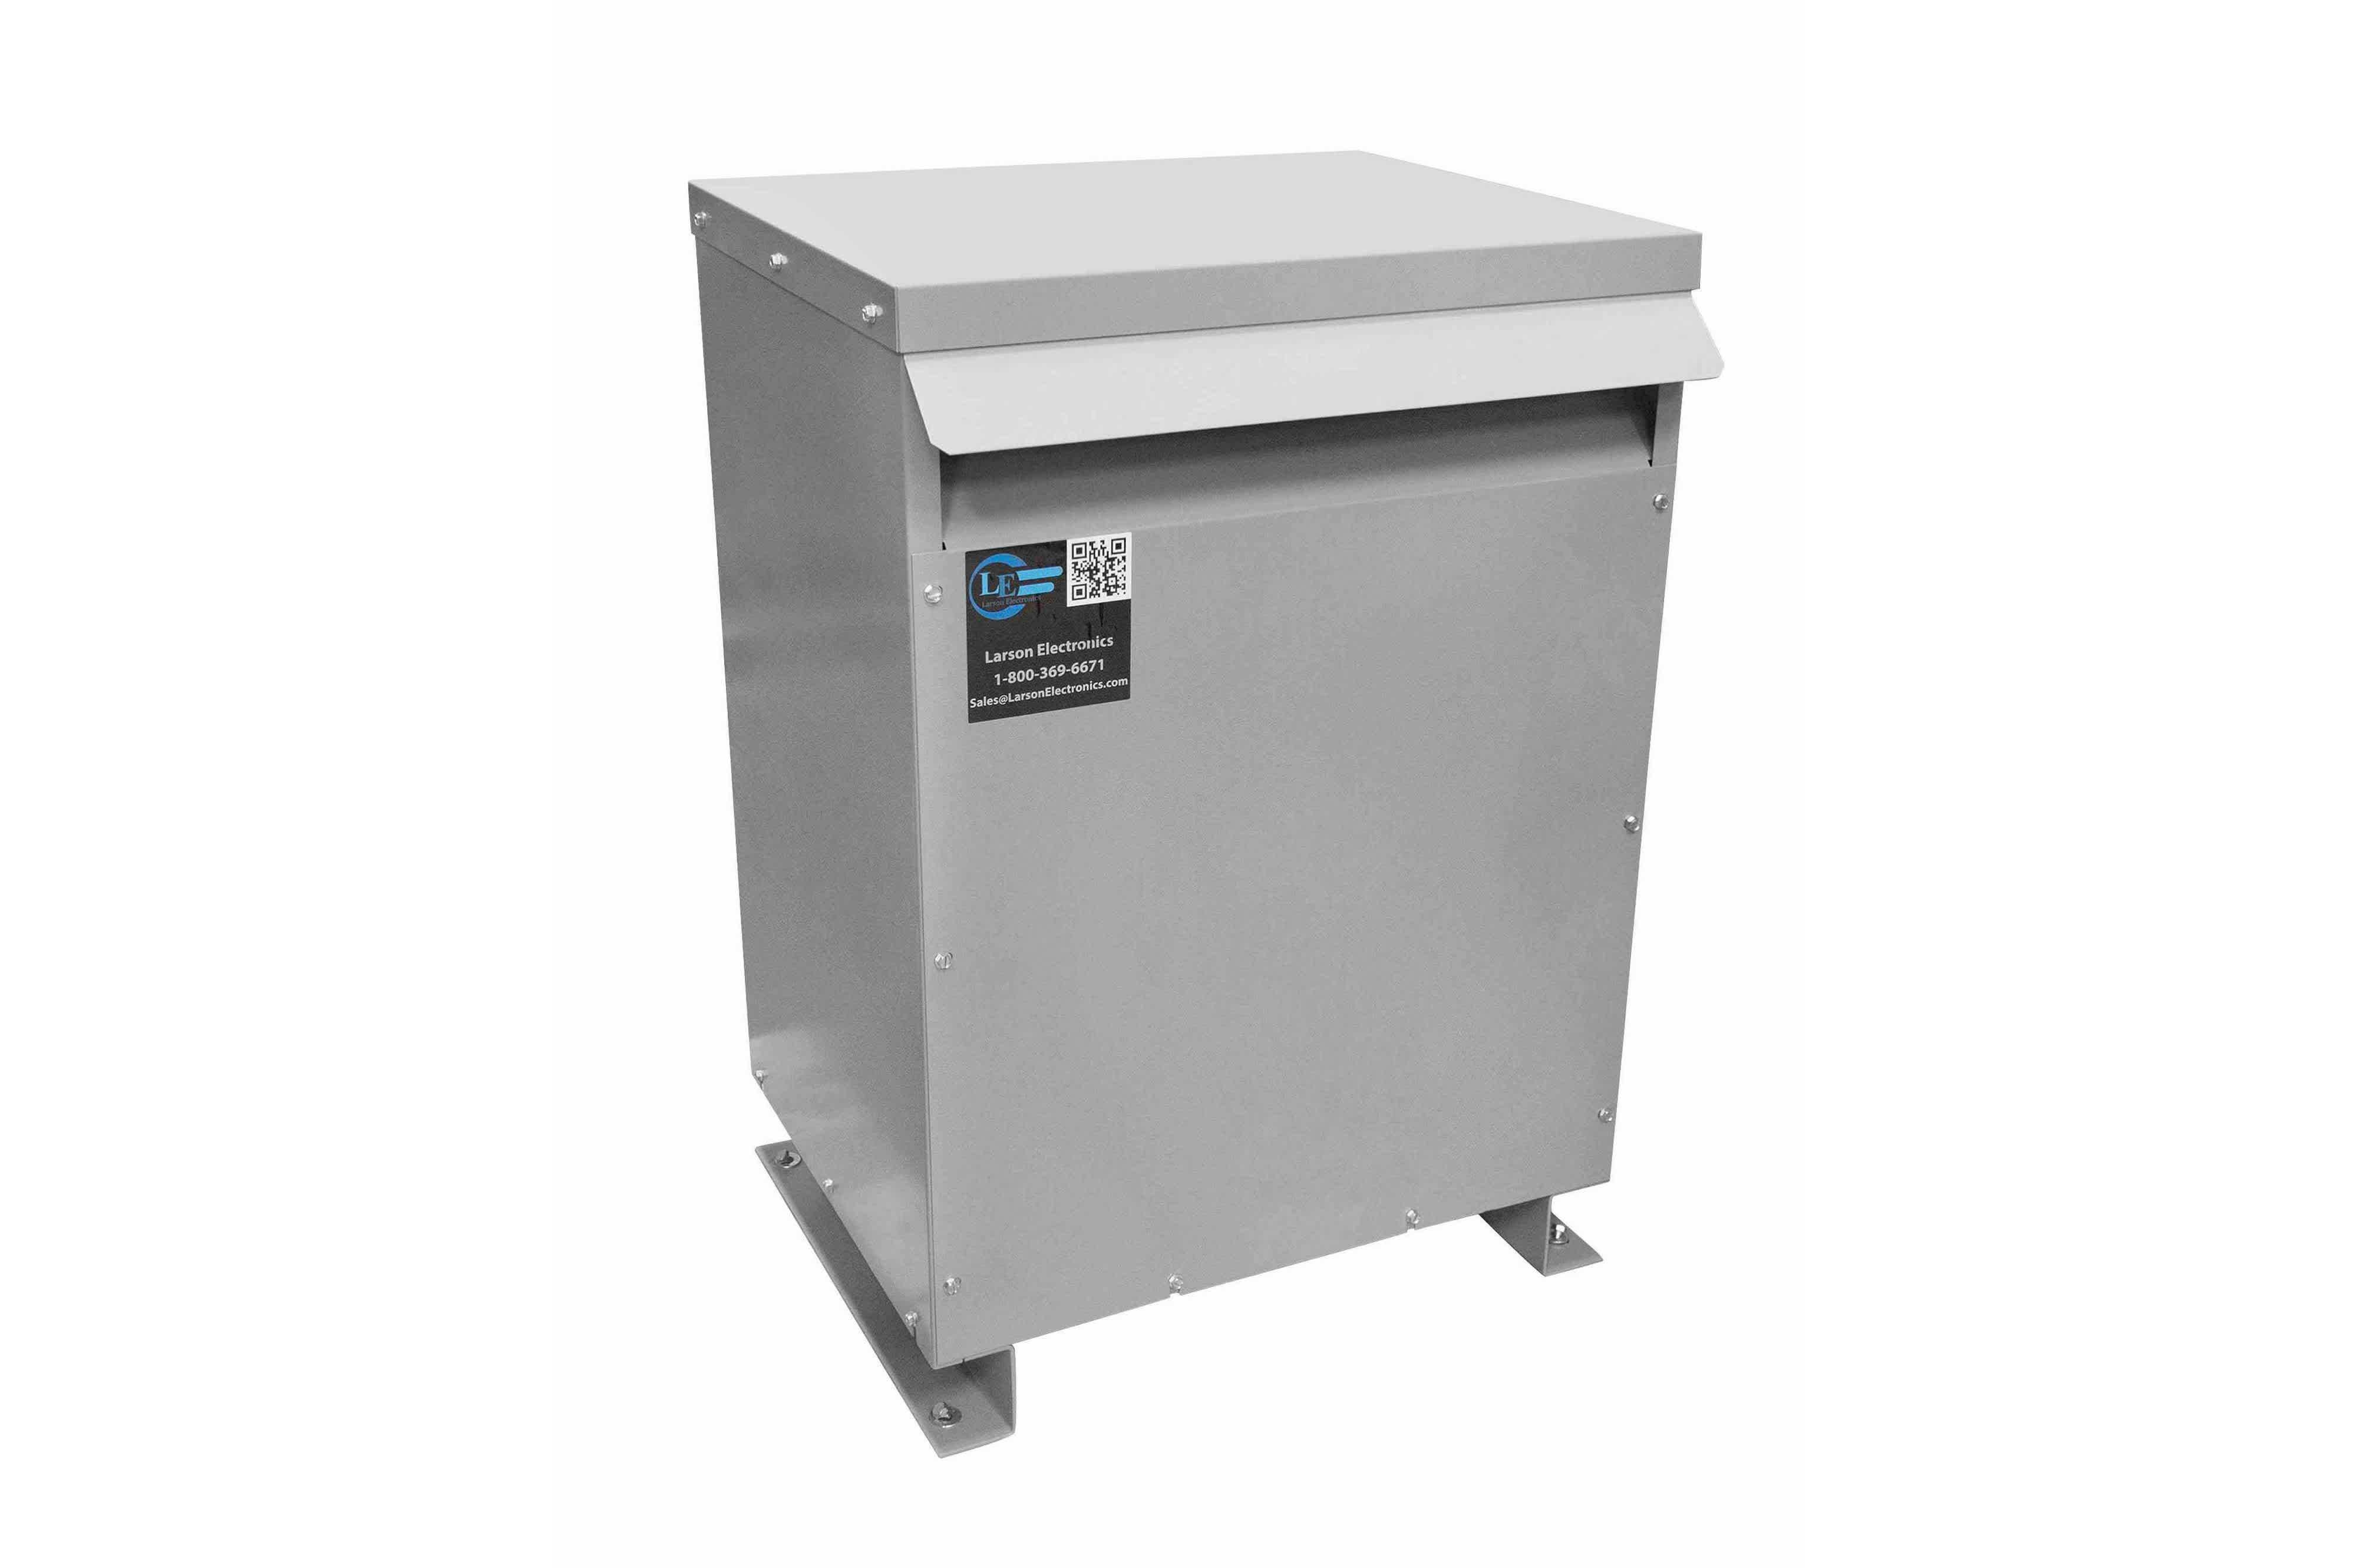 55 kVA 3PH Isolation Transformer, 208V Wye Primary, 240V/120 Delta Secondary, N3R, Ventilated, 60 Hz